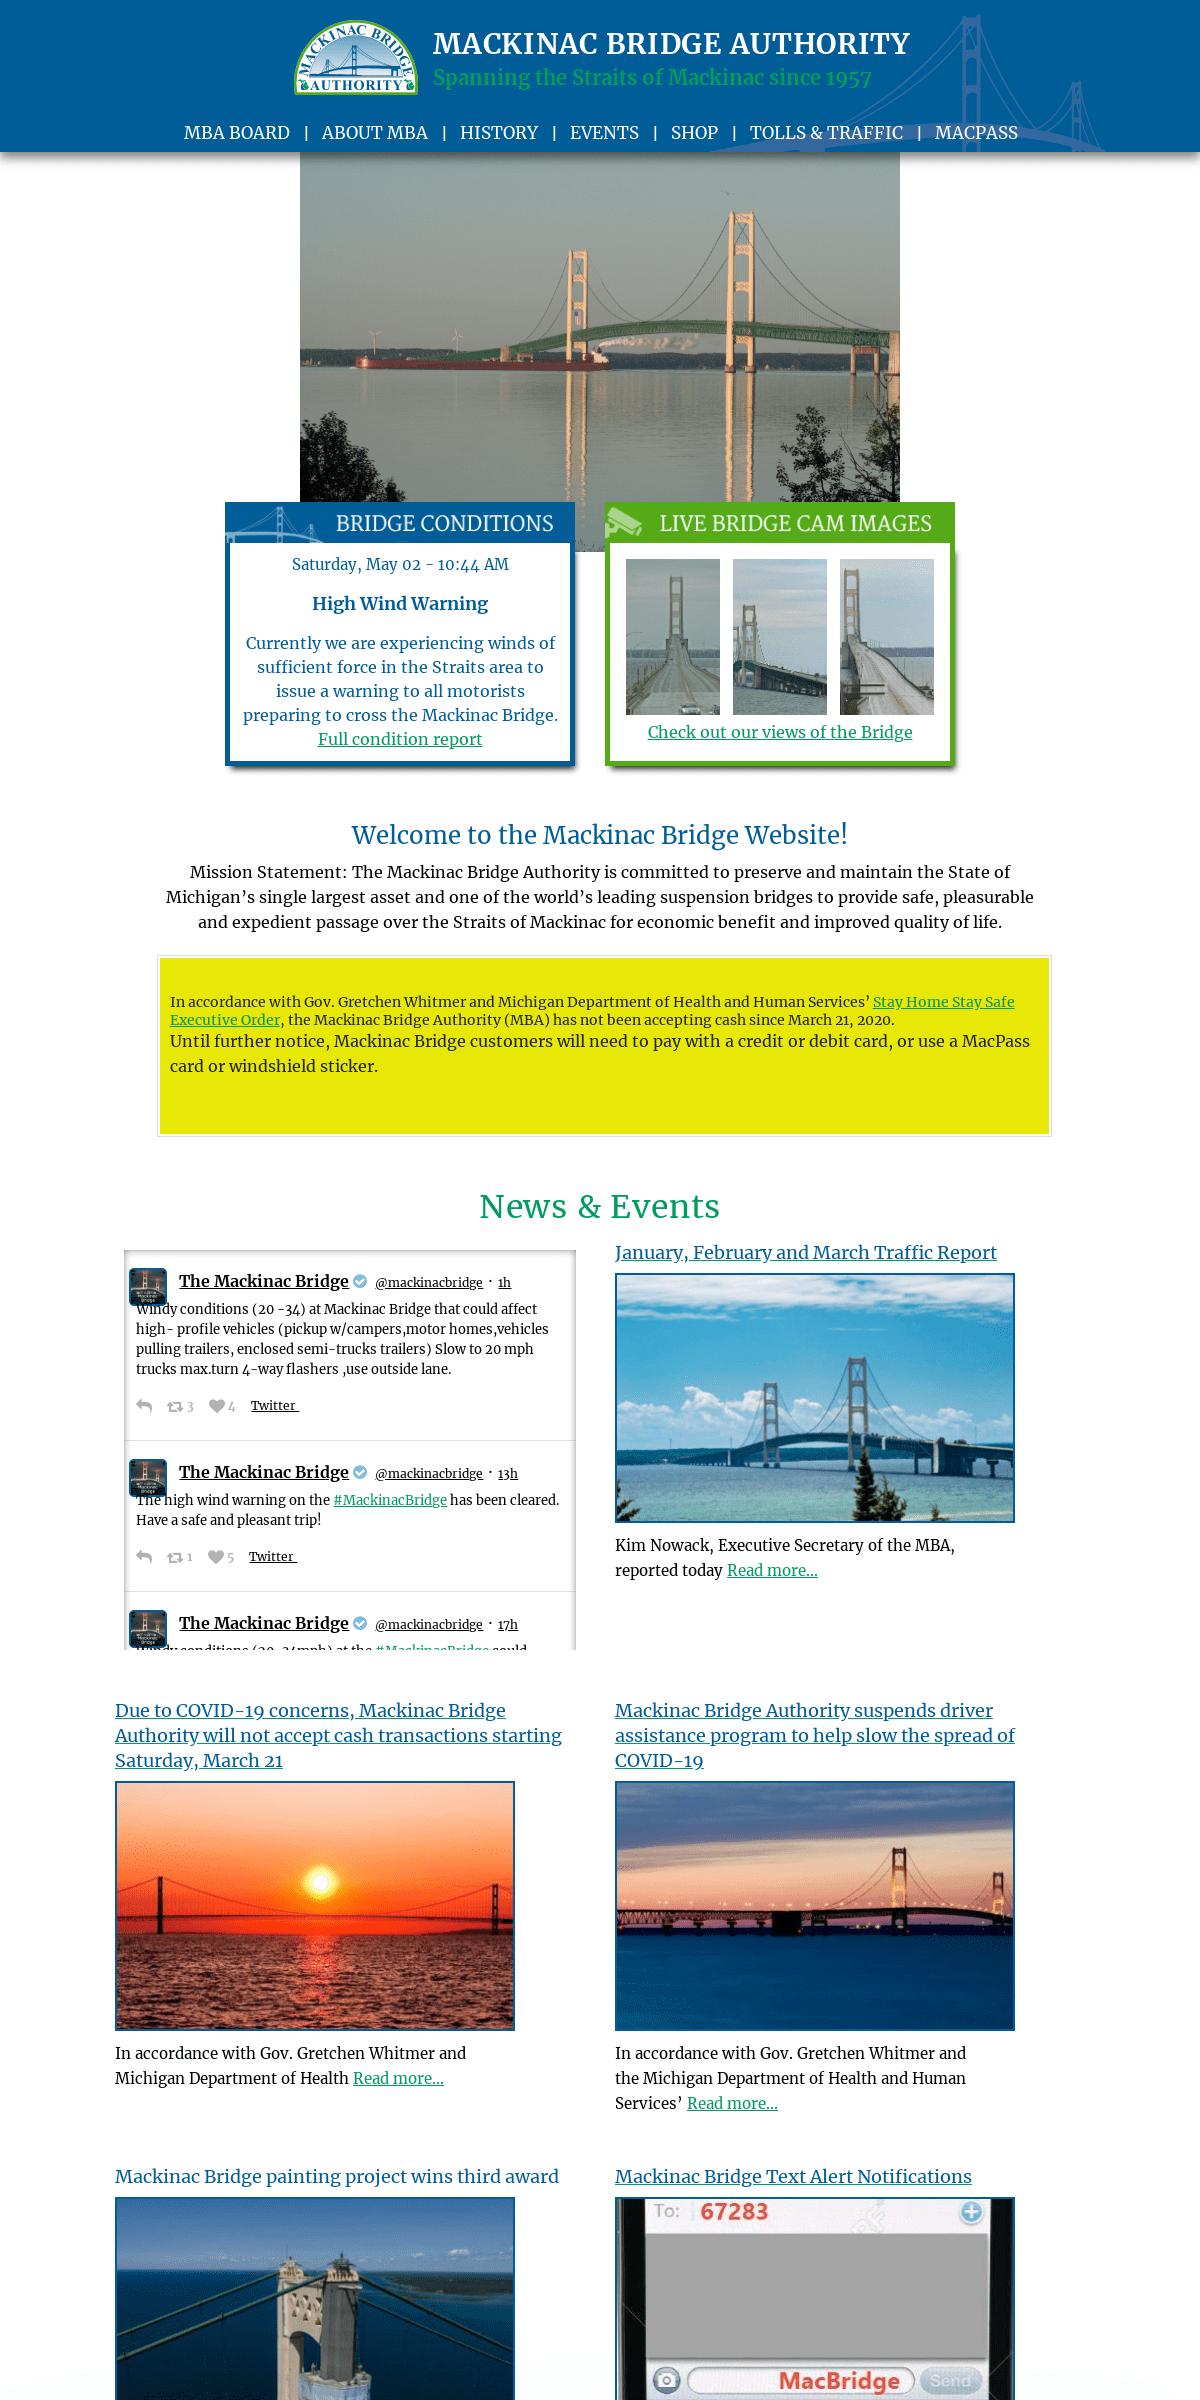 ArchiveBay.com - mackinacbridge.org - Mackinac Bridge Authority, St. Ignace Michigan